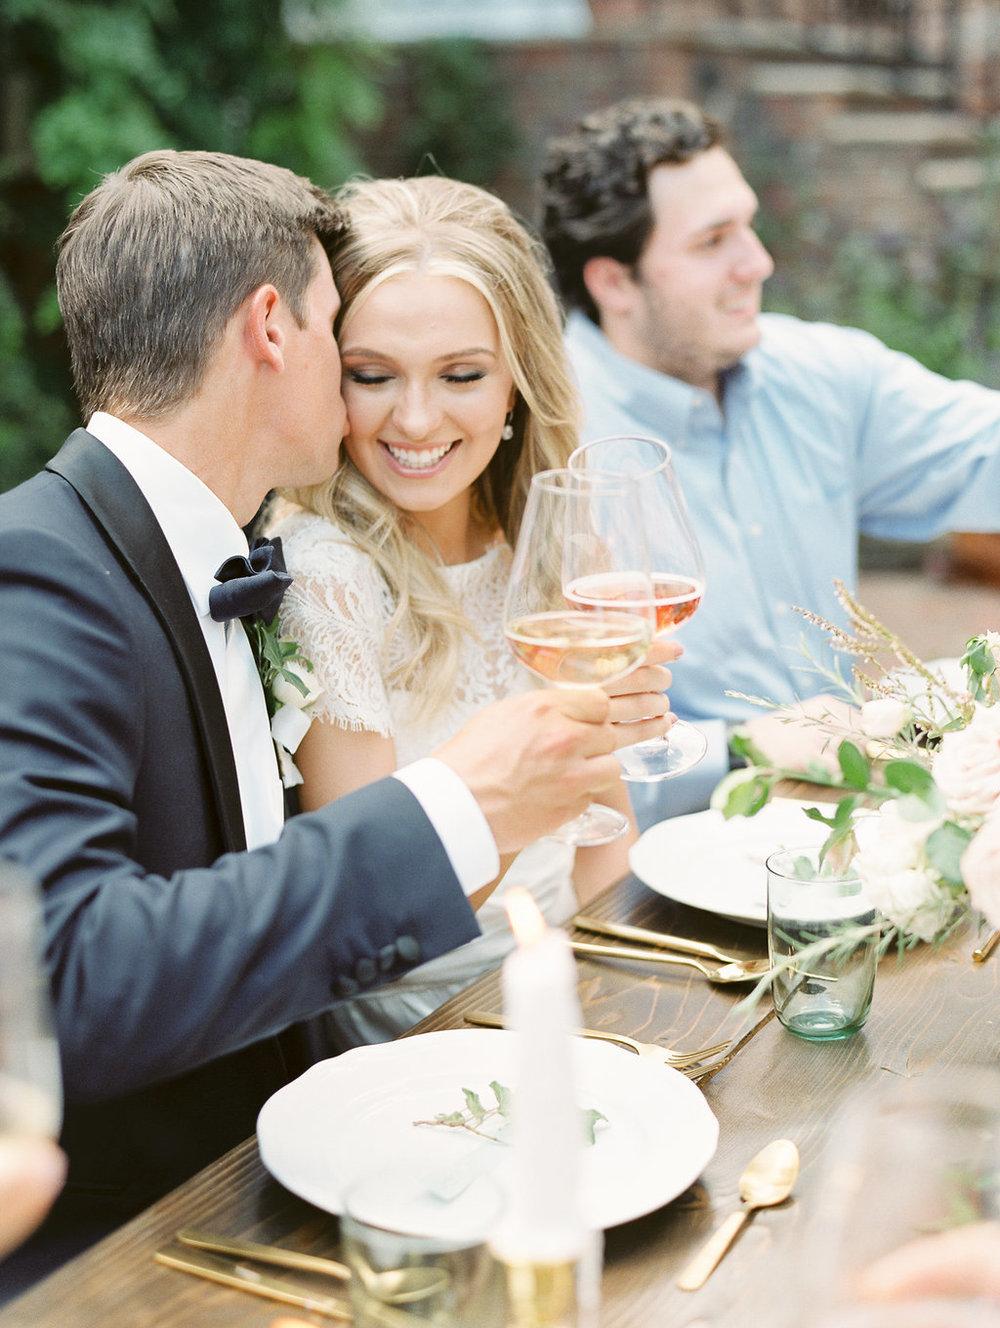 athens-founders-memorial-garden-wedding-photography-hannah-forsberg-atlanta-wedding-photographer-25.jpg